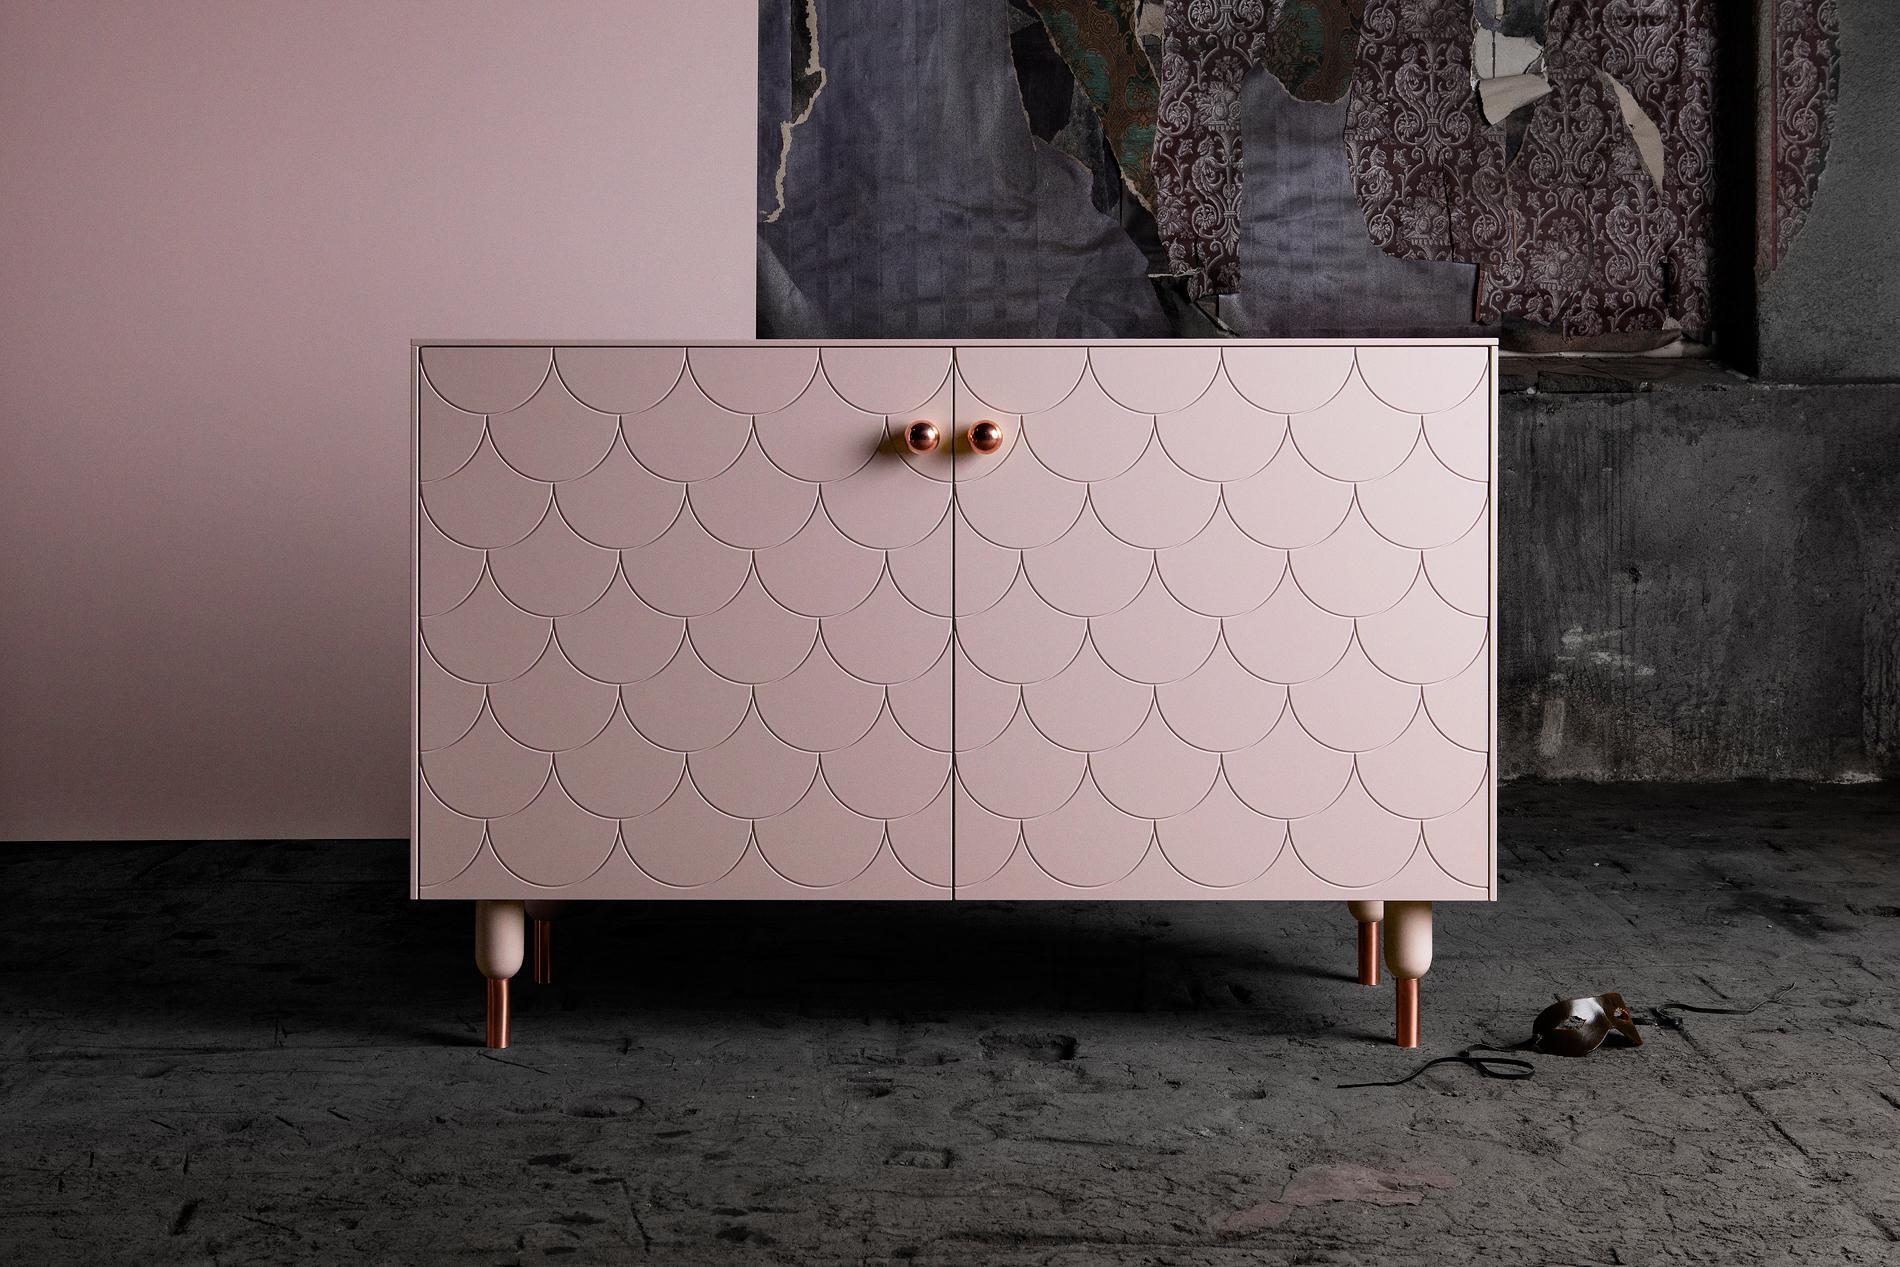 Porte Laque Blanc Ikea dix conseils pour customiser ses meubles ikea - madame figaro